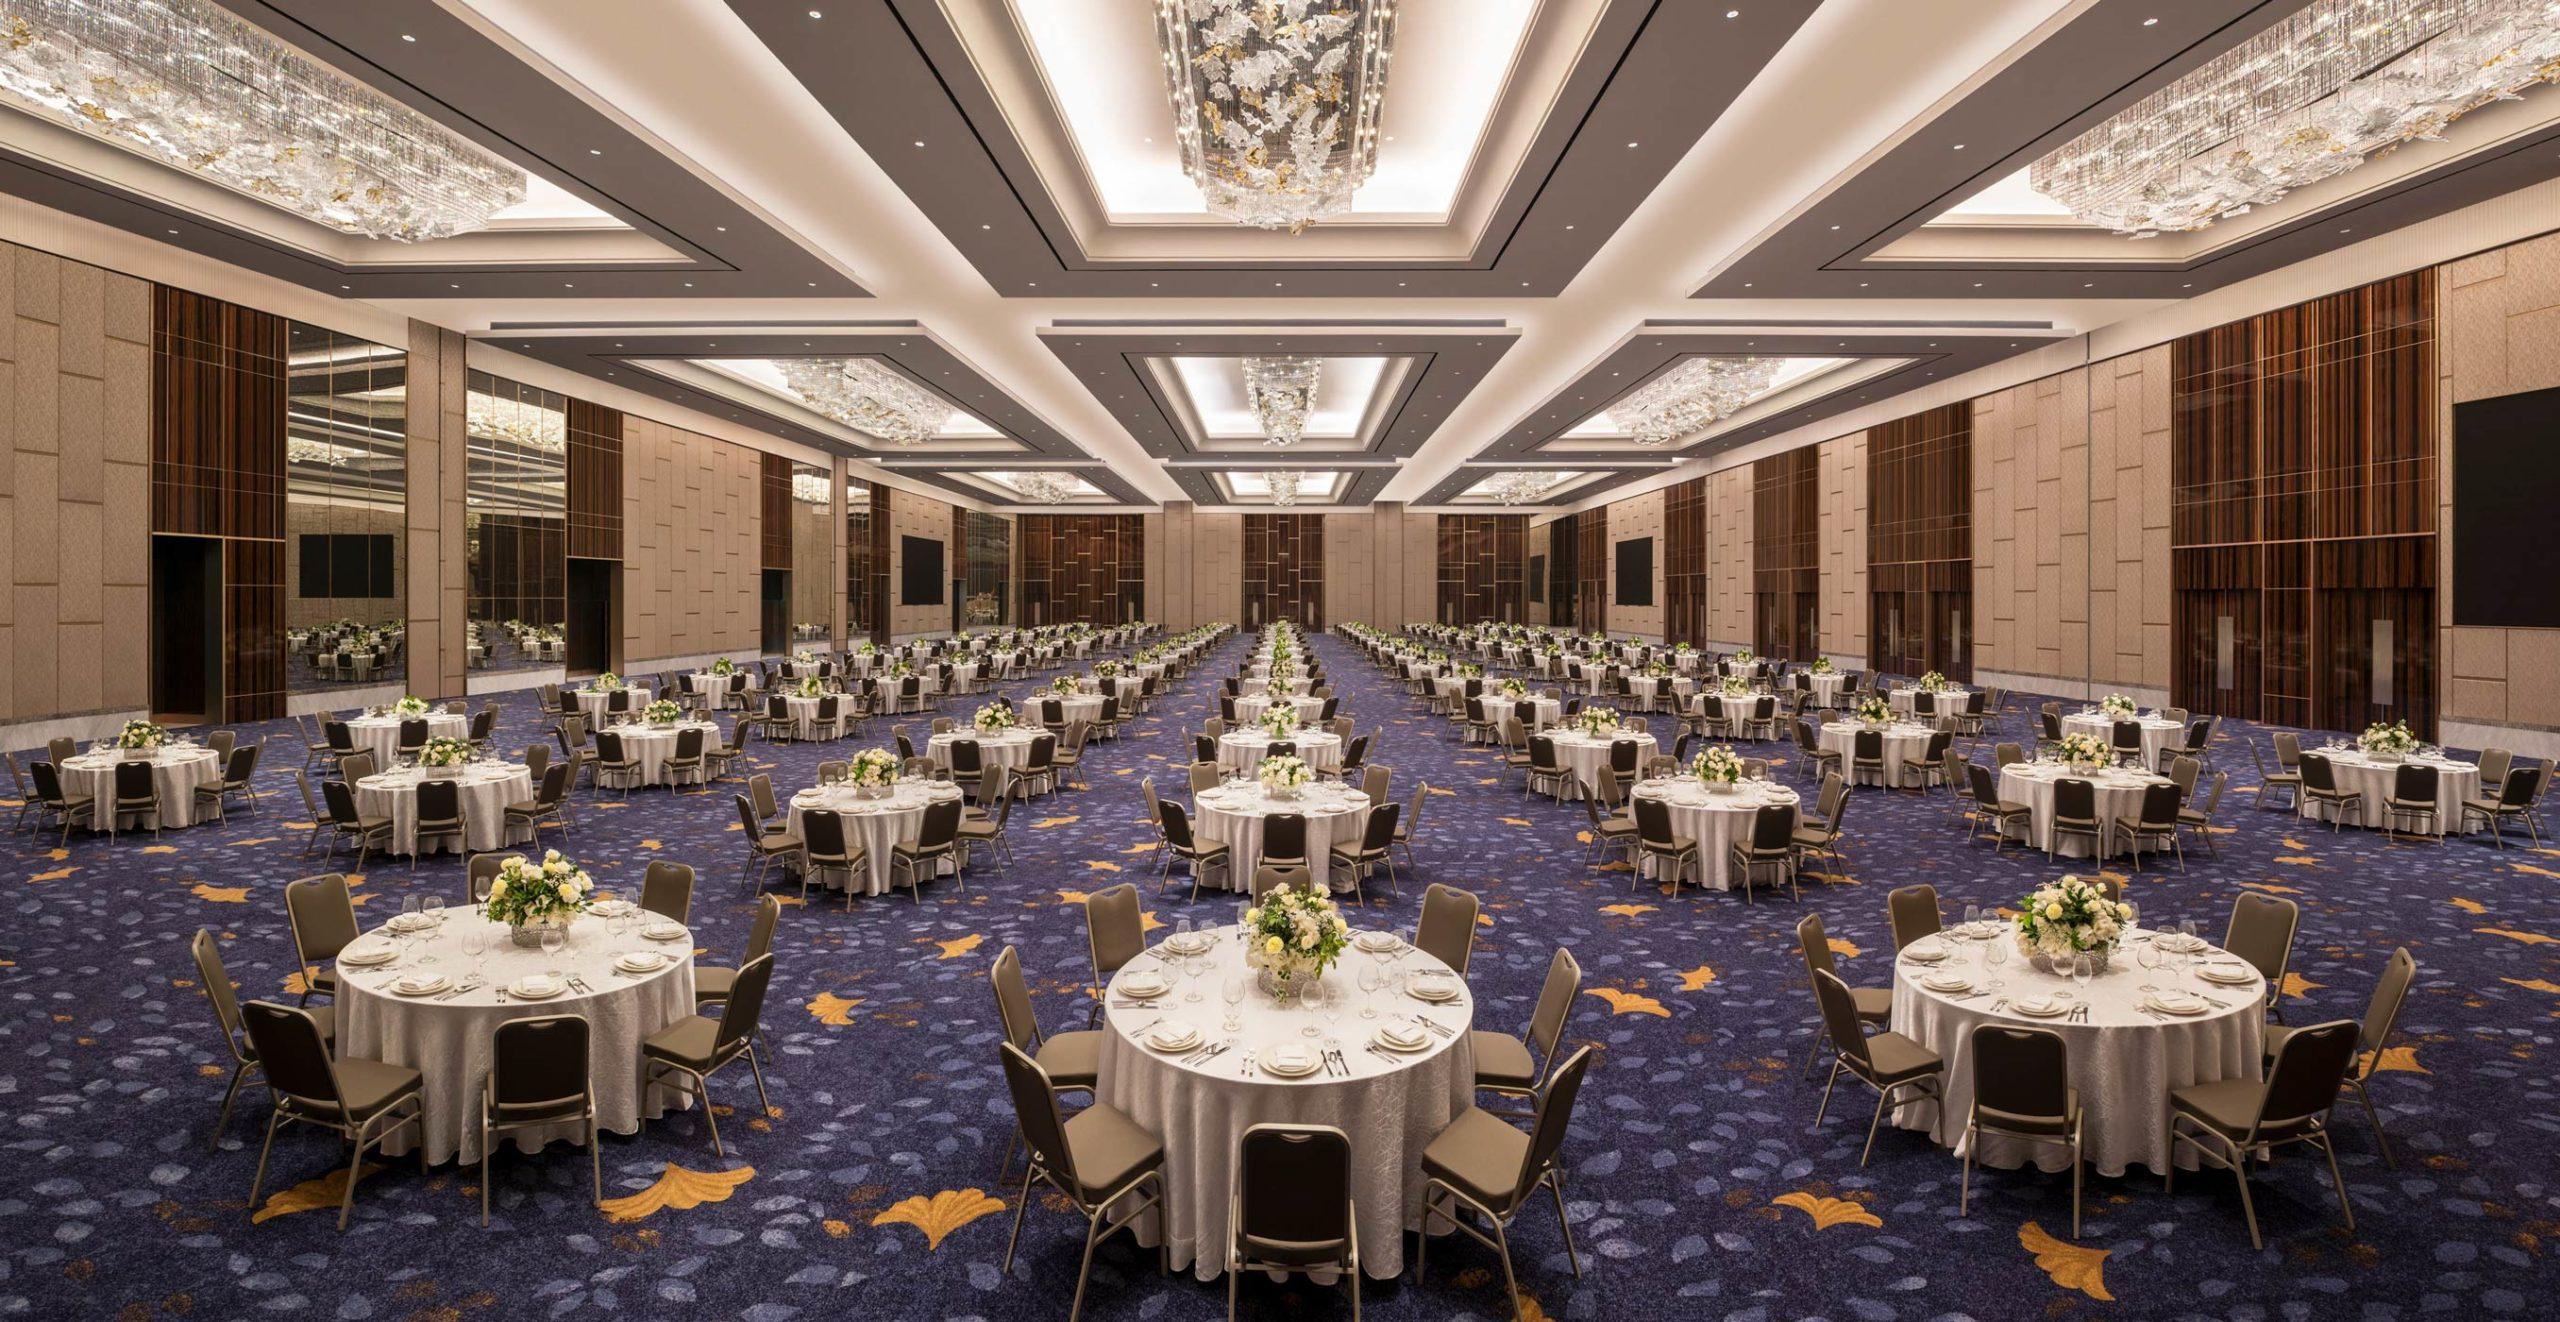 Ballroom-Wedding-Setup-V1-for-web